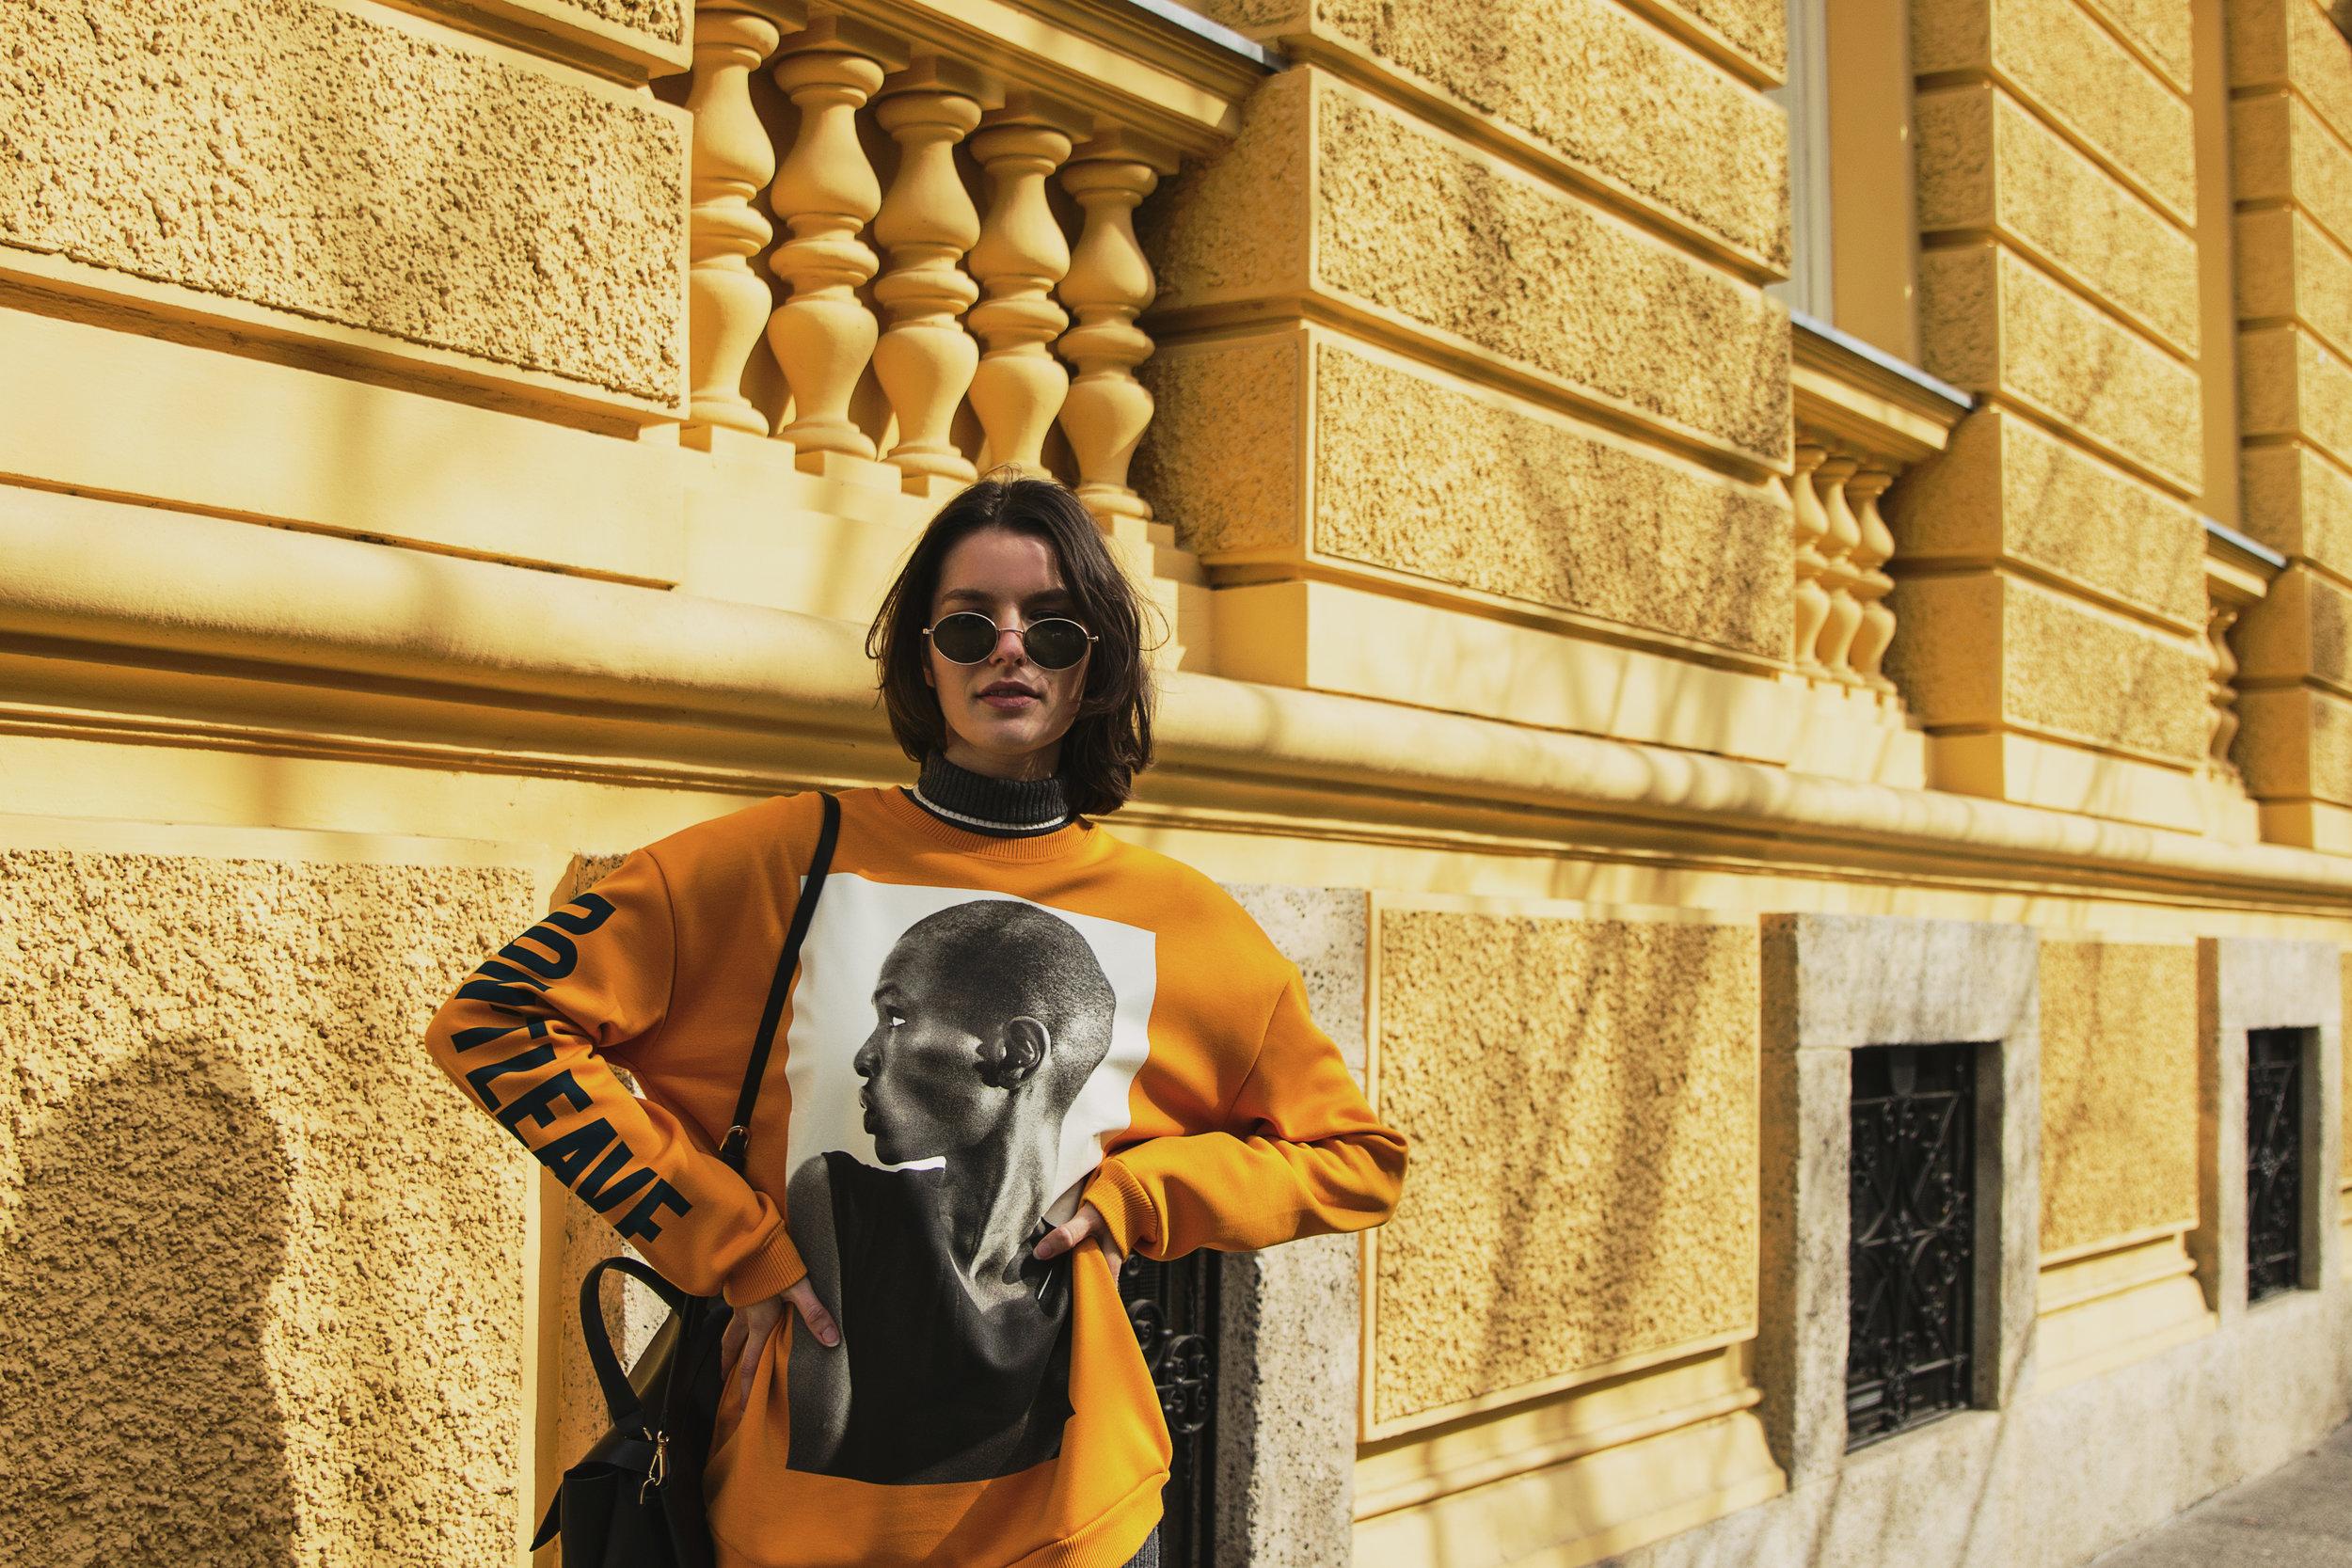 luka-lajic-fashion-photography-zagreb-croatia (1).jpg